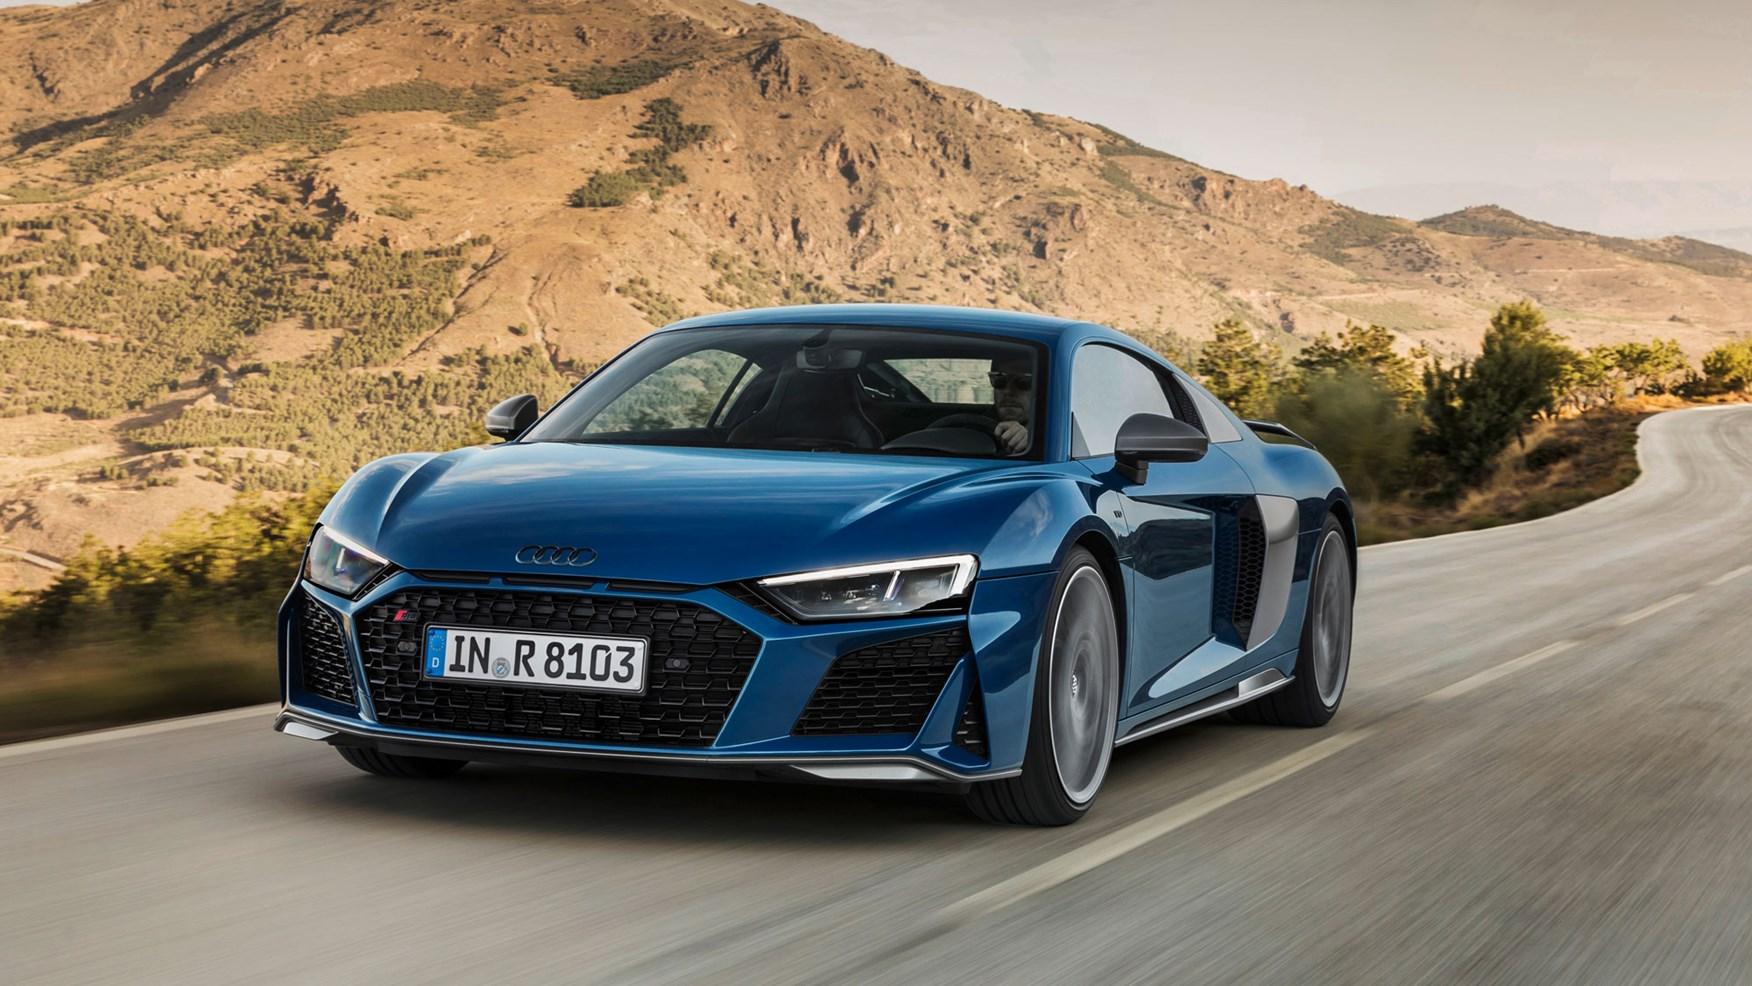 Kekurangan Audi R8 V10 2019 Spesifikasi